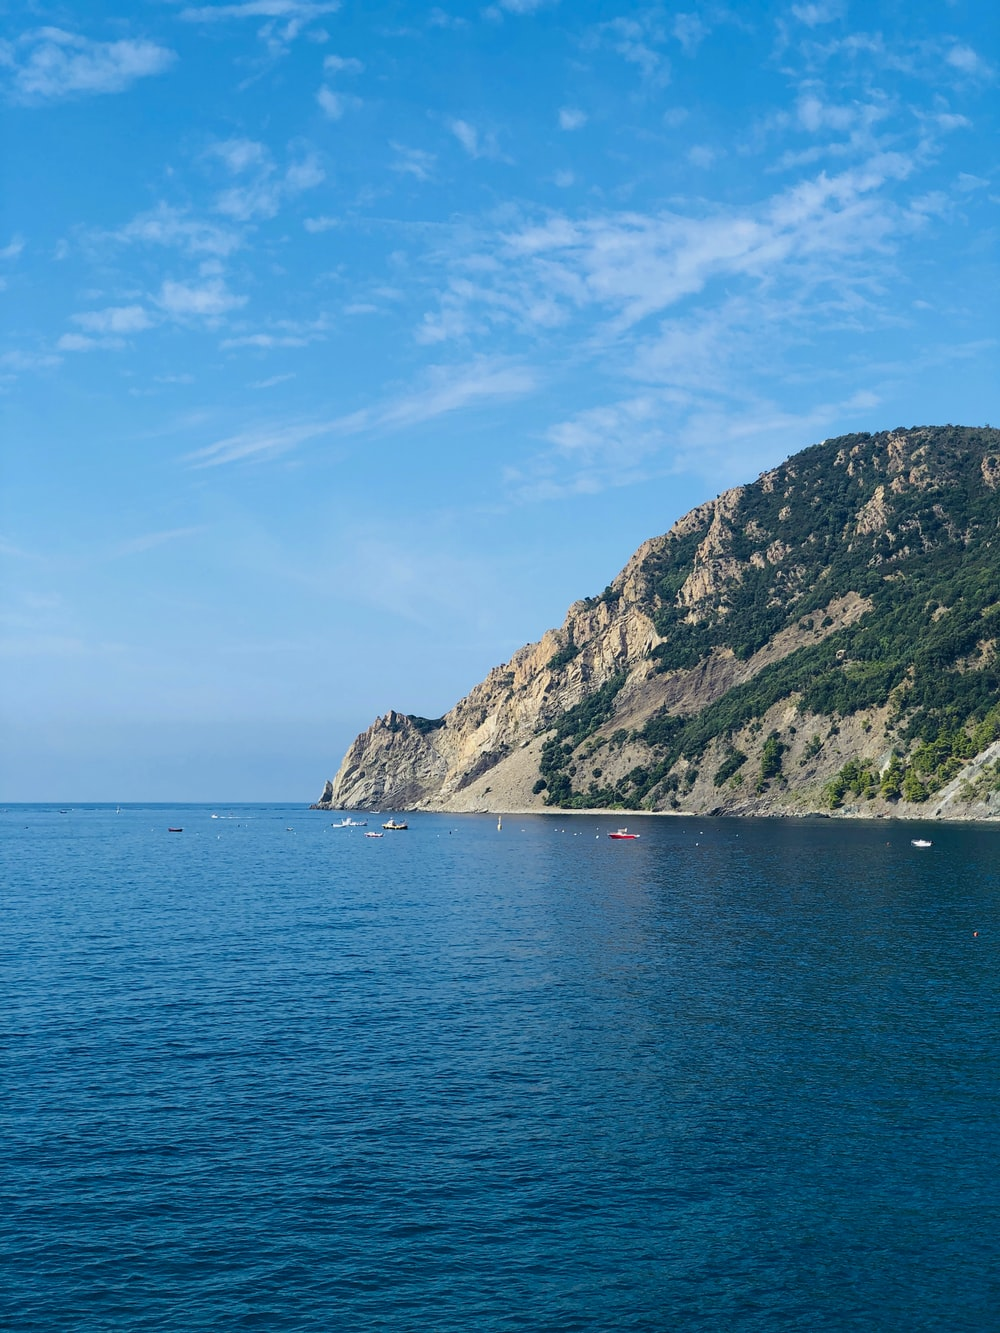 rock formation near sea